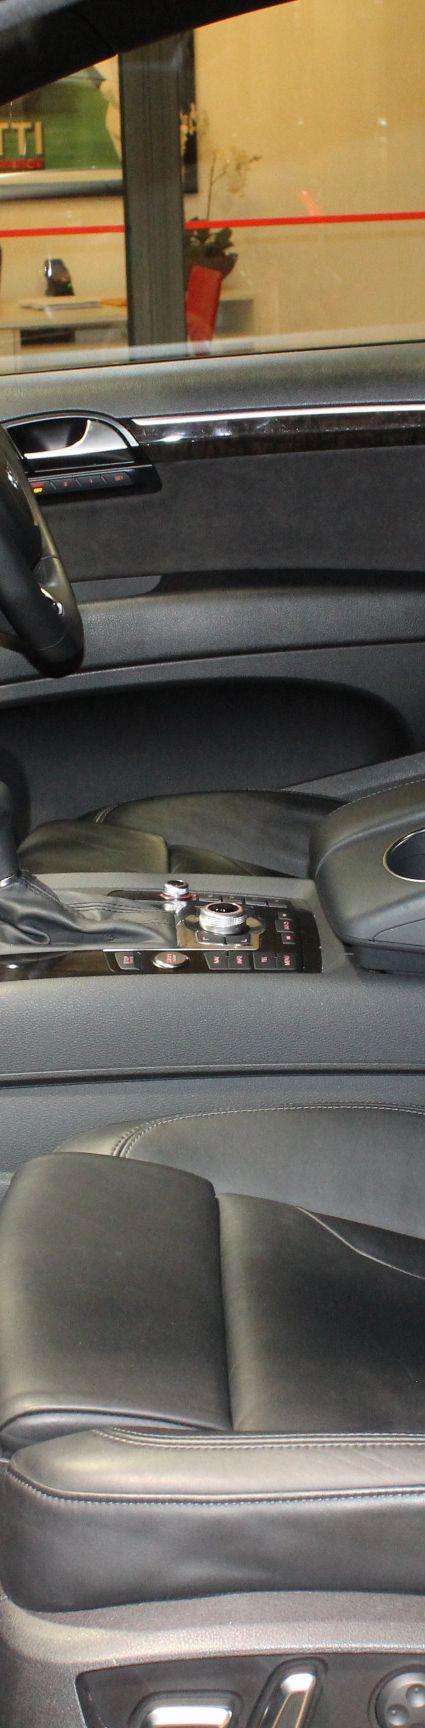 2013 Audi Q7 TDI Wagon 7st 5dr Tiptronic 8sp quattro 4.2DTT [MY14] - for sale in Australia